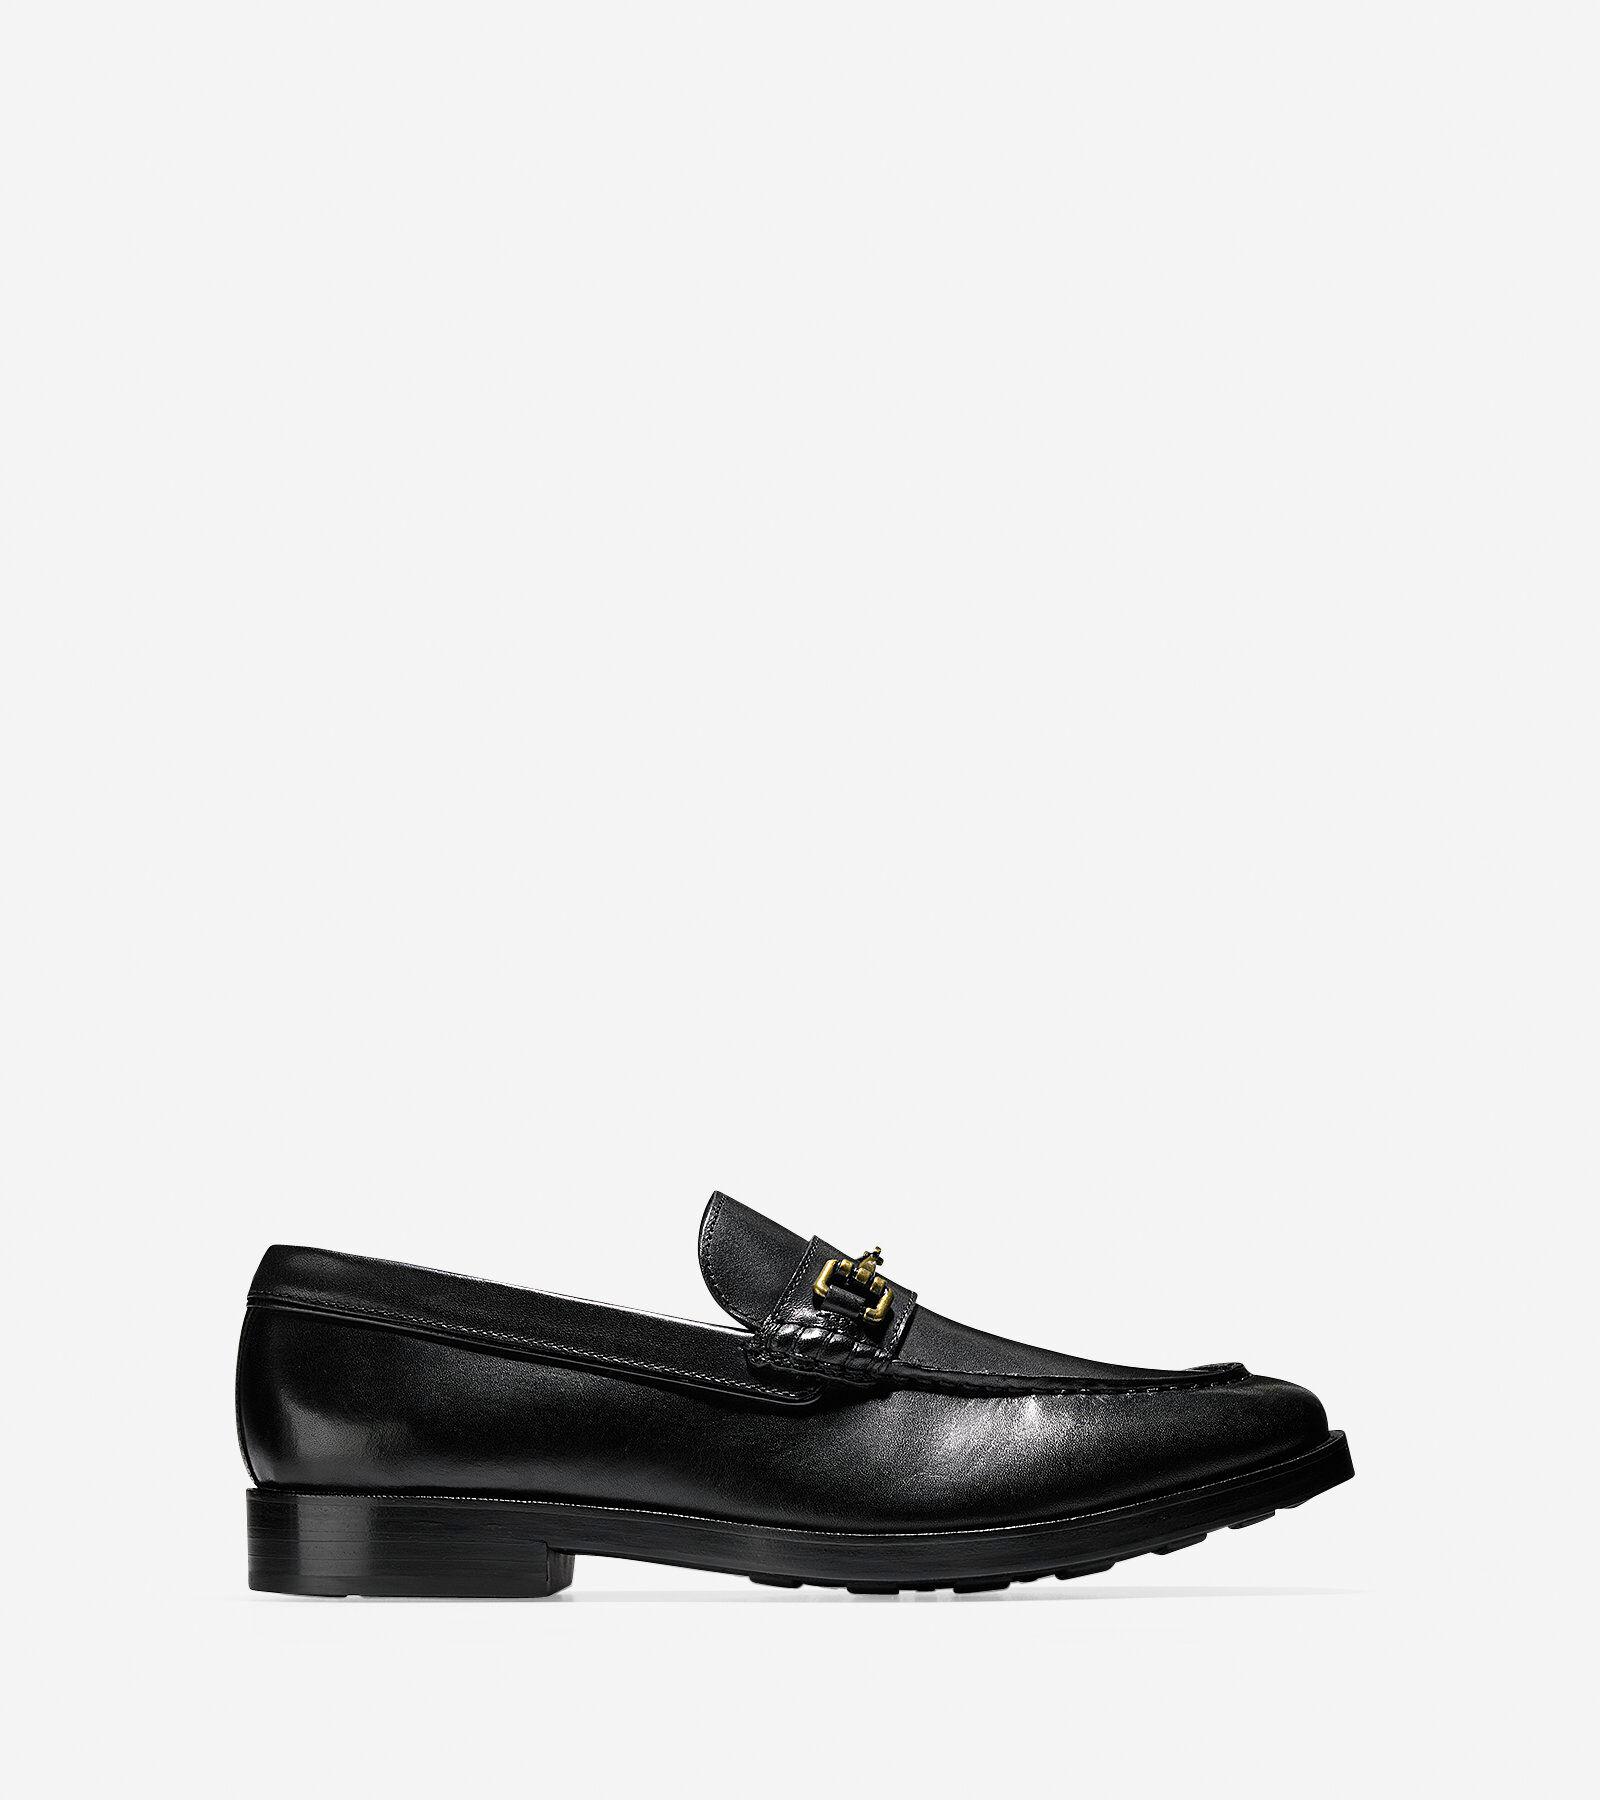 Cole Haan Dress Revolution Hamilton Grand Leather Bit Loafers 1L7WG